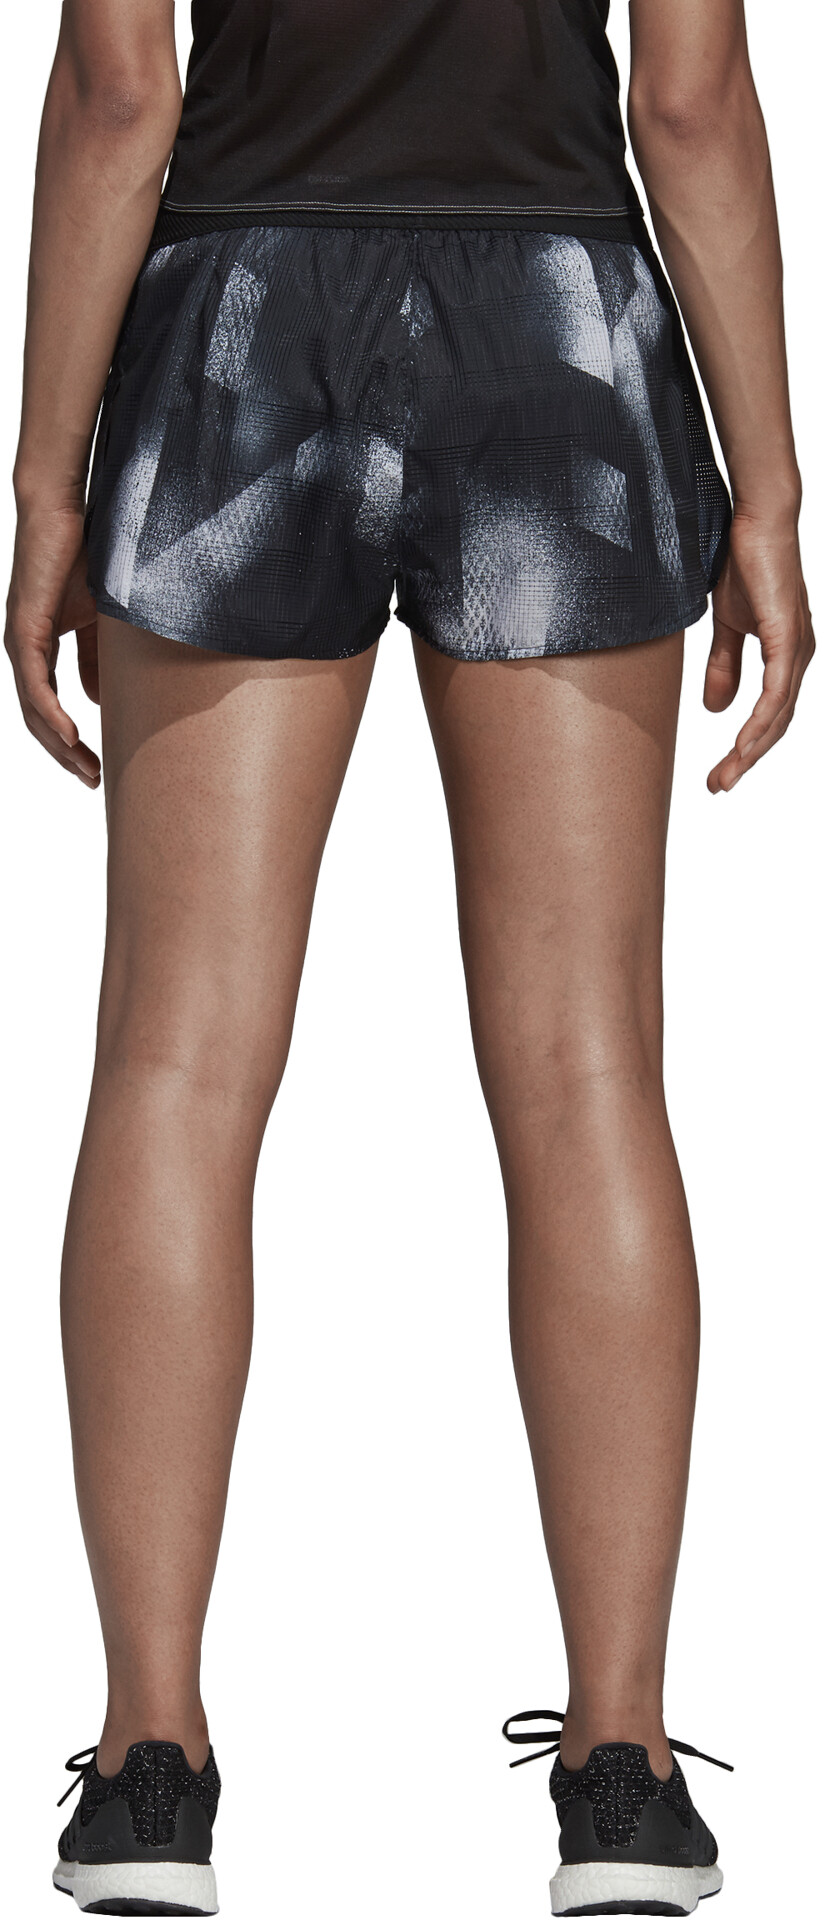 Cortos Running Mujer Pantalones Grisnegro 2 Split Sub Adidas 1qnPxBwax